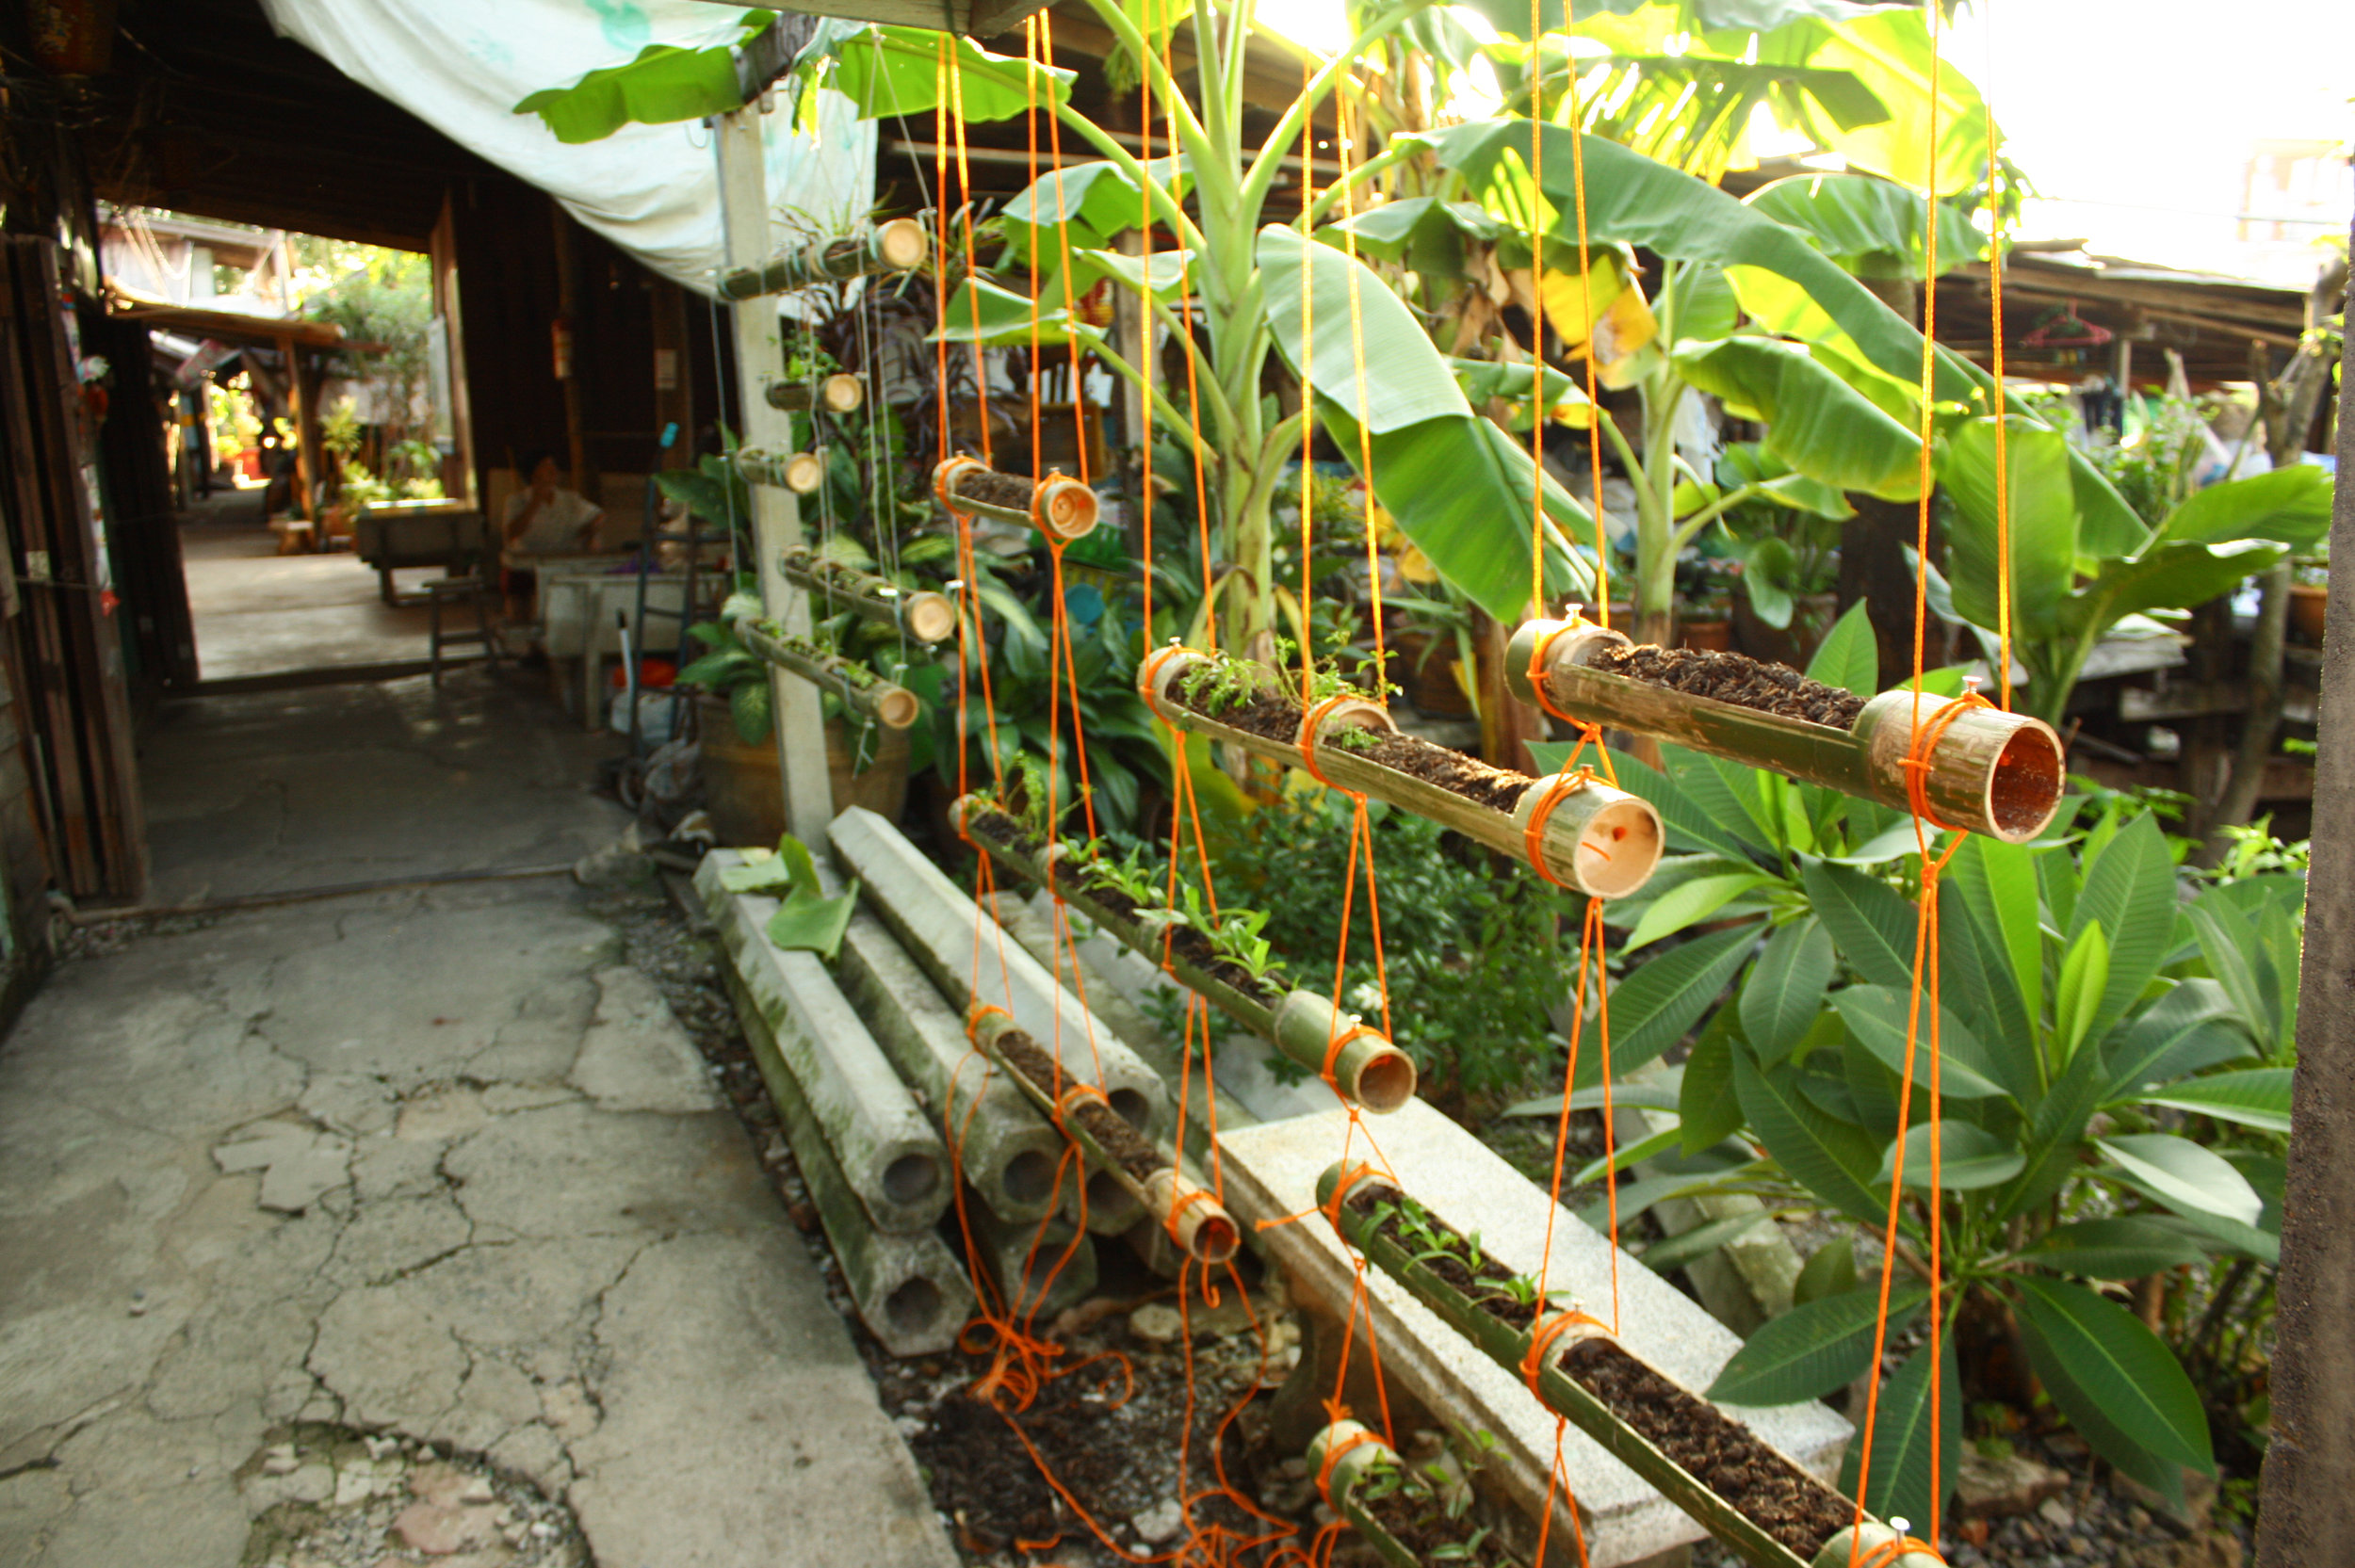 Community furniture Klong 3, Thailand: structure for a vertical garden and herb garden using bamboo